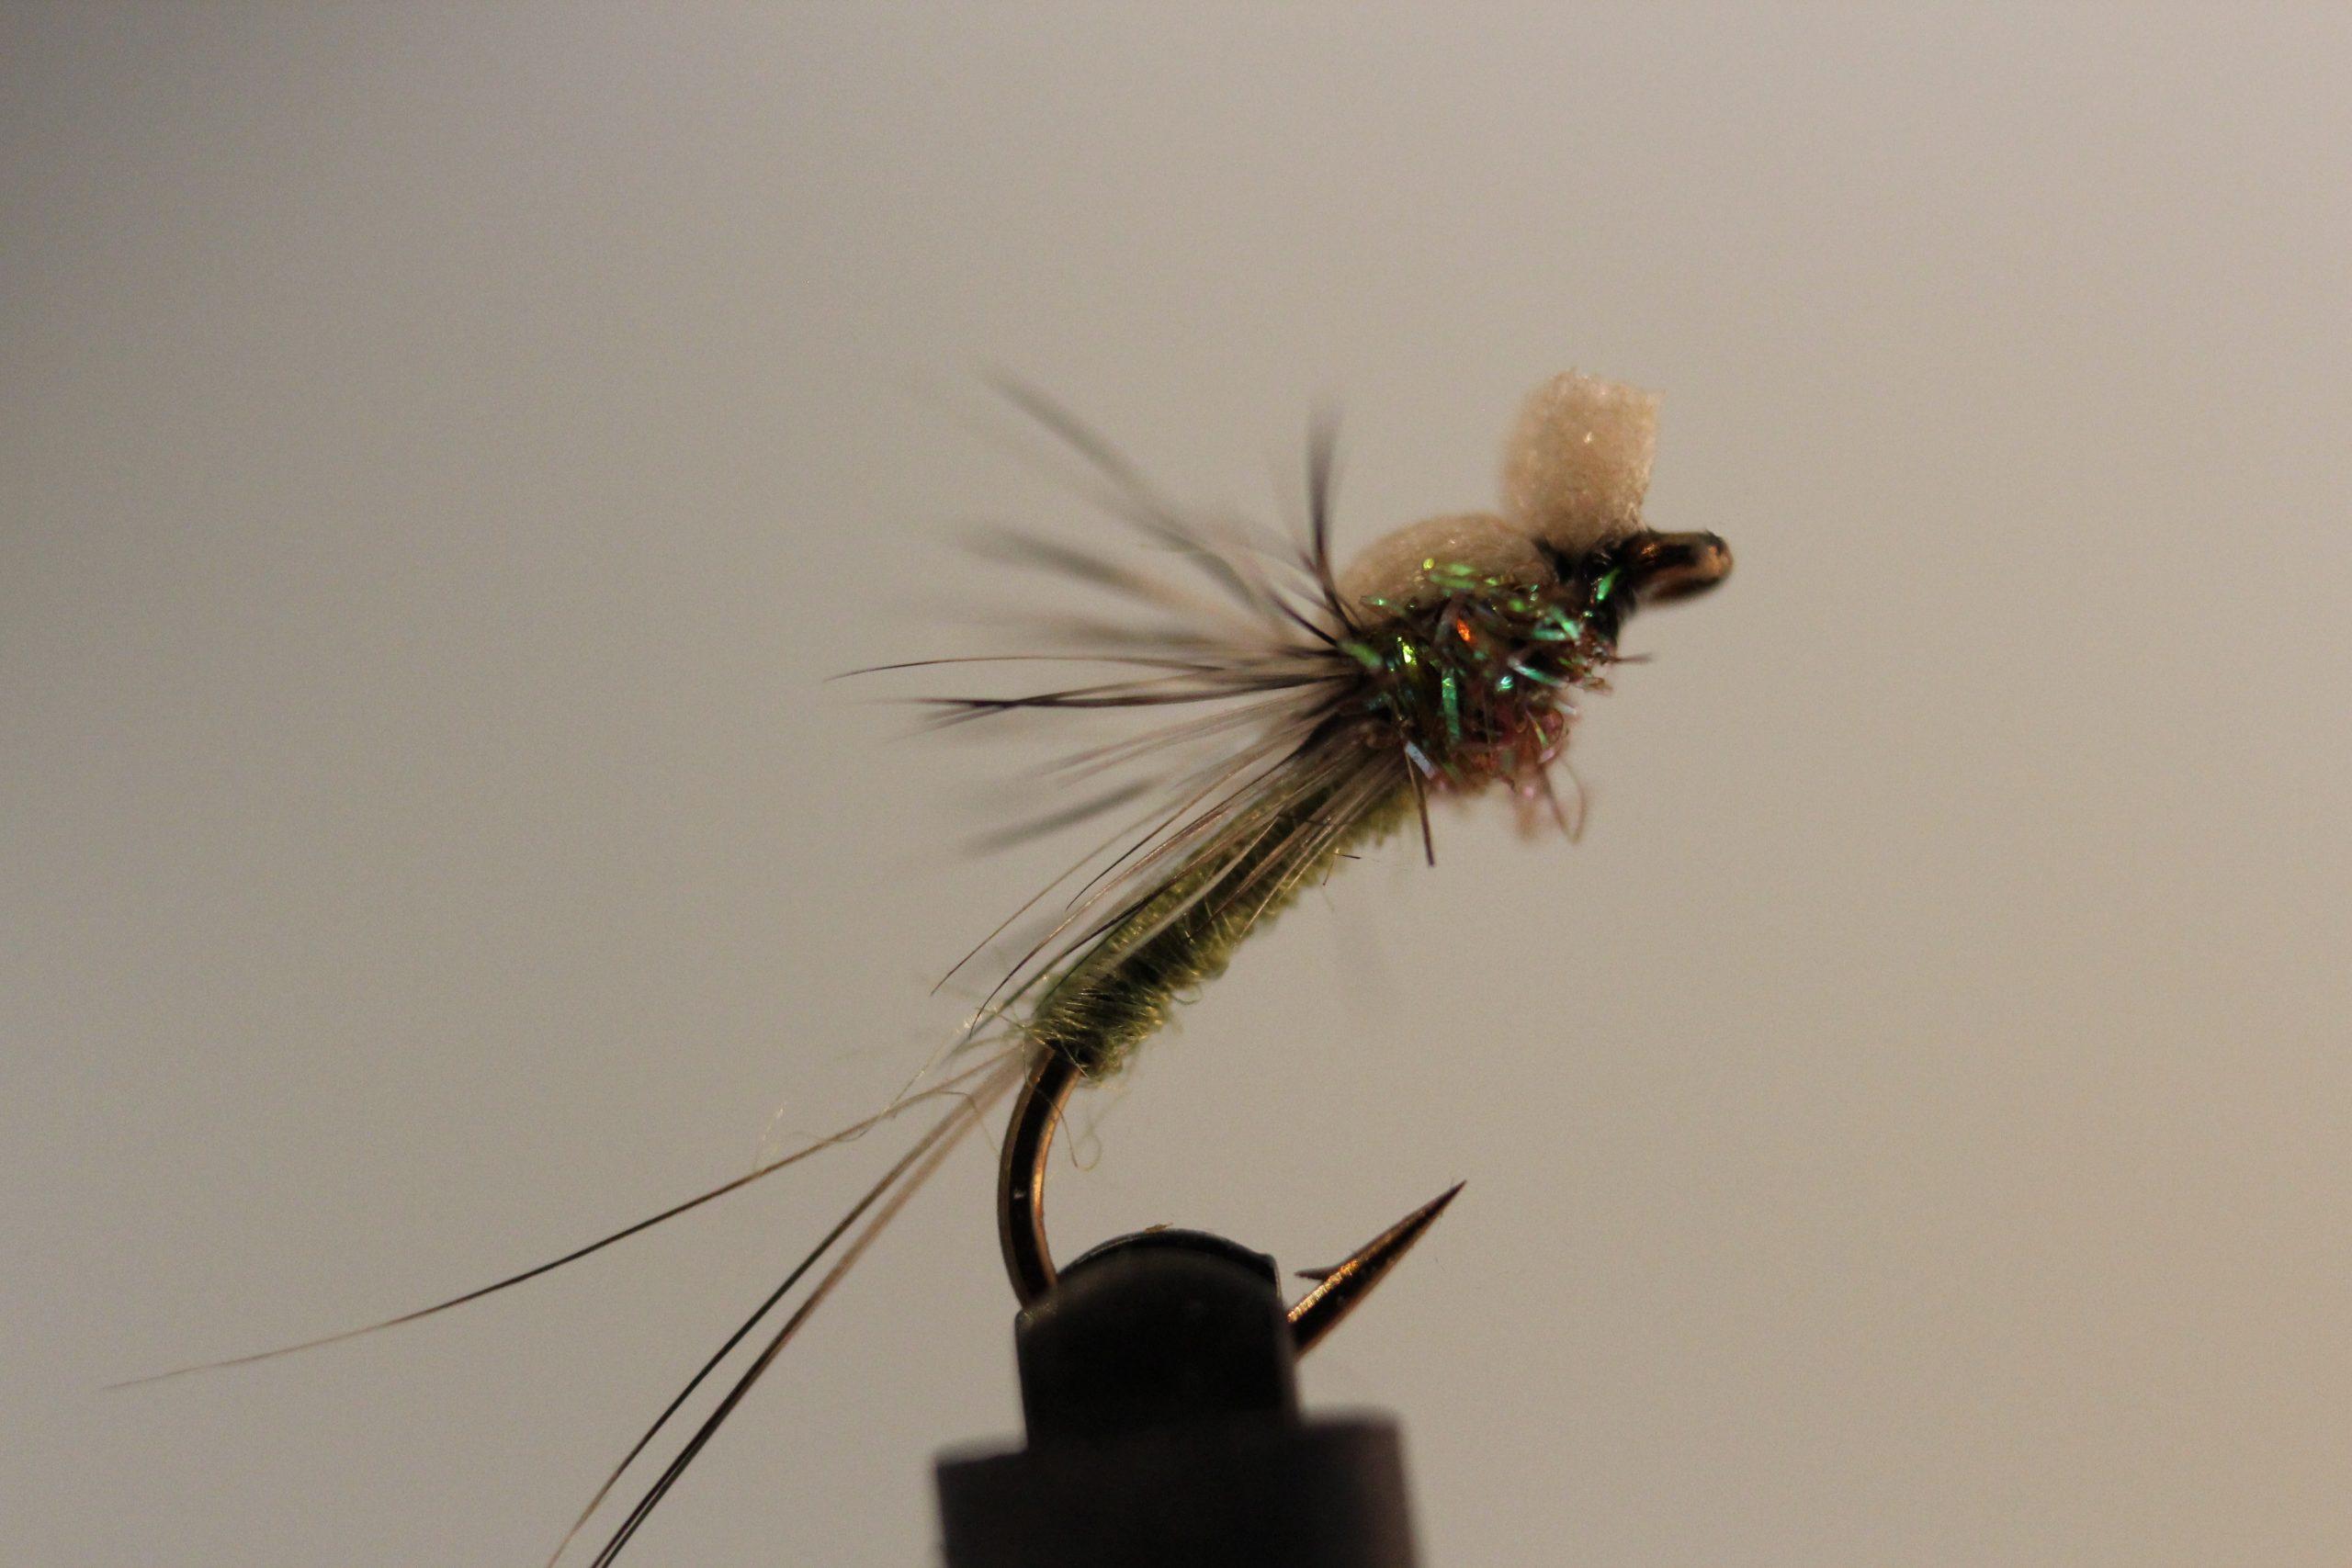 Olive Princeps døgnflueklekker